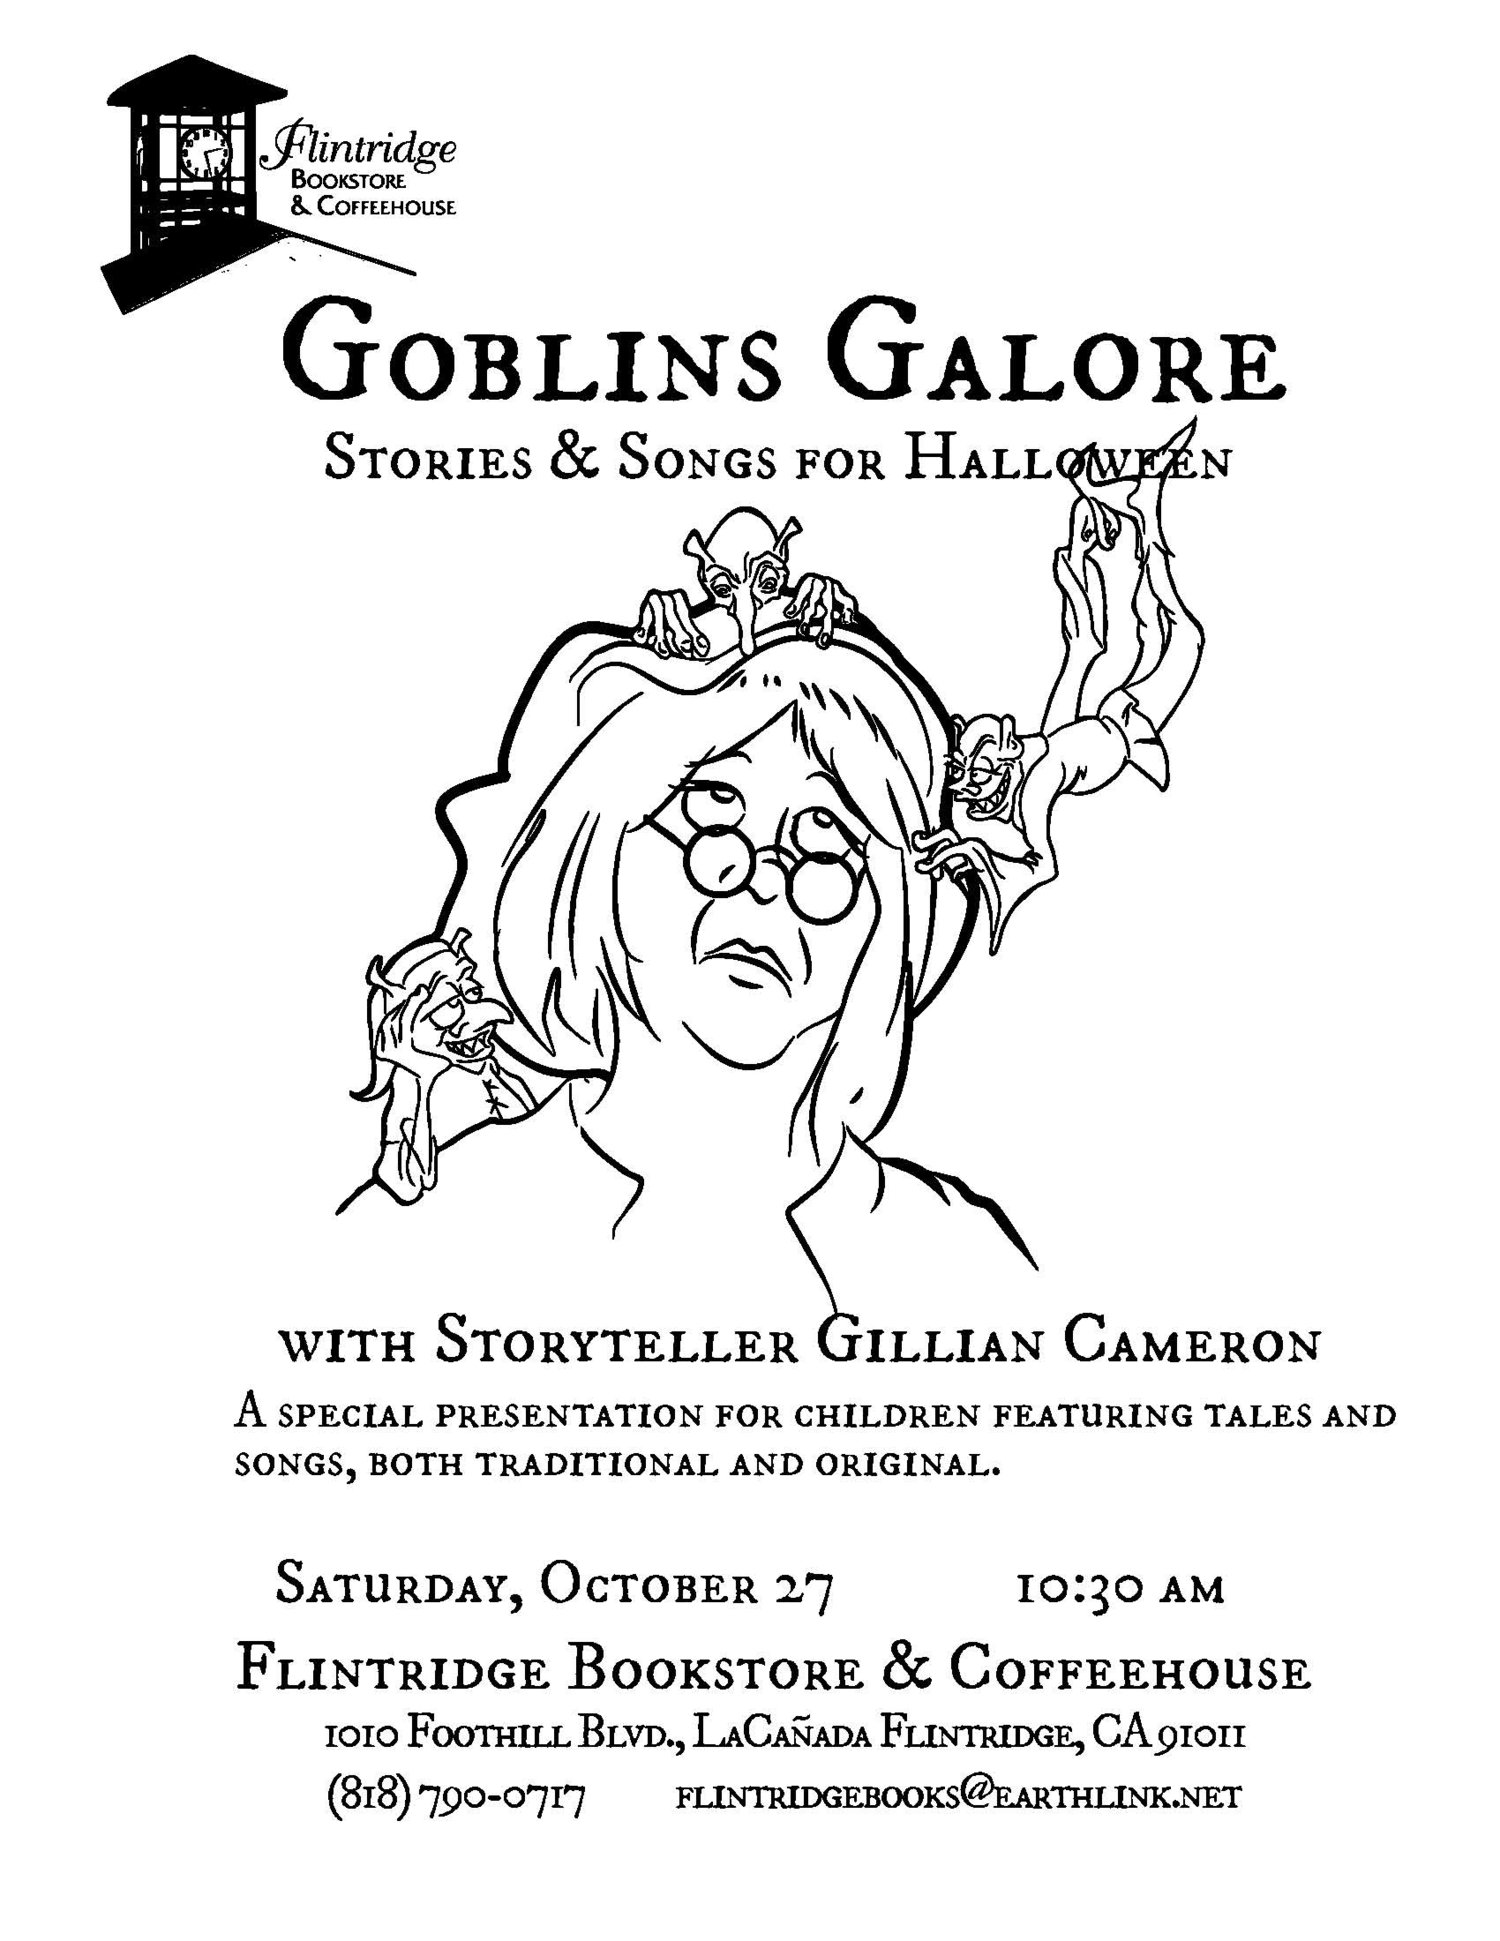 Goblins Galore Stories Songs For Halloween Flintridge Bookstore